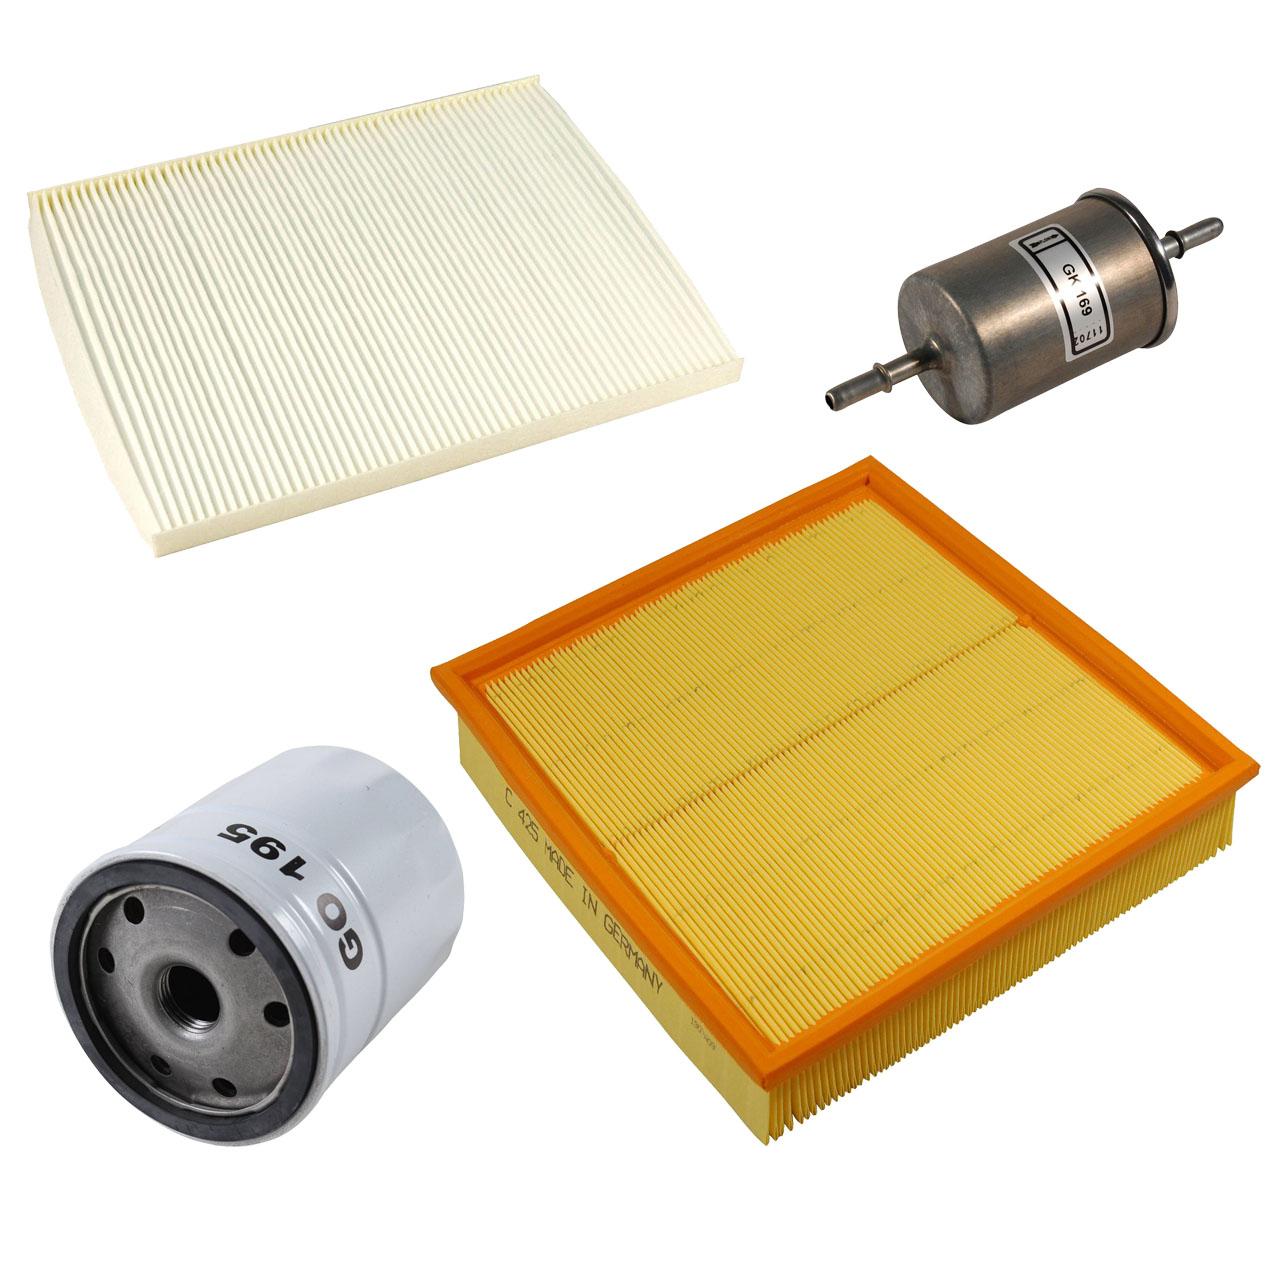 Inspektionskit Filterpaket OPEL Omega B 2.0/2.2 16V 2.5/3.0 V6 bis 08.1999